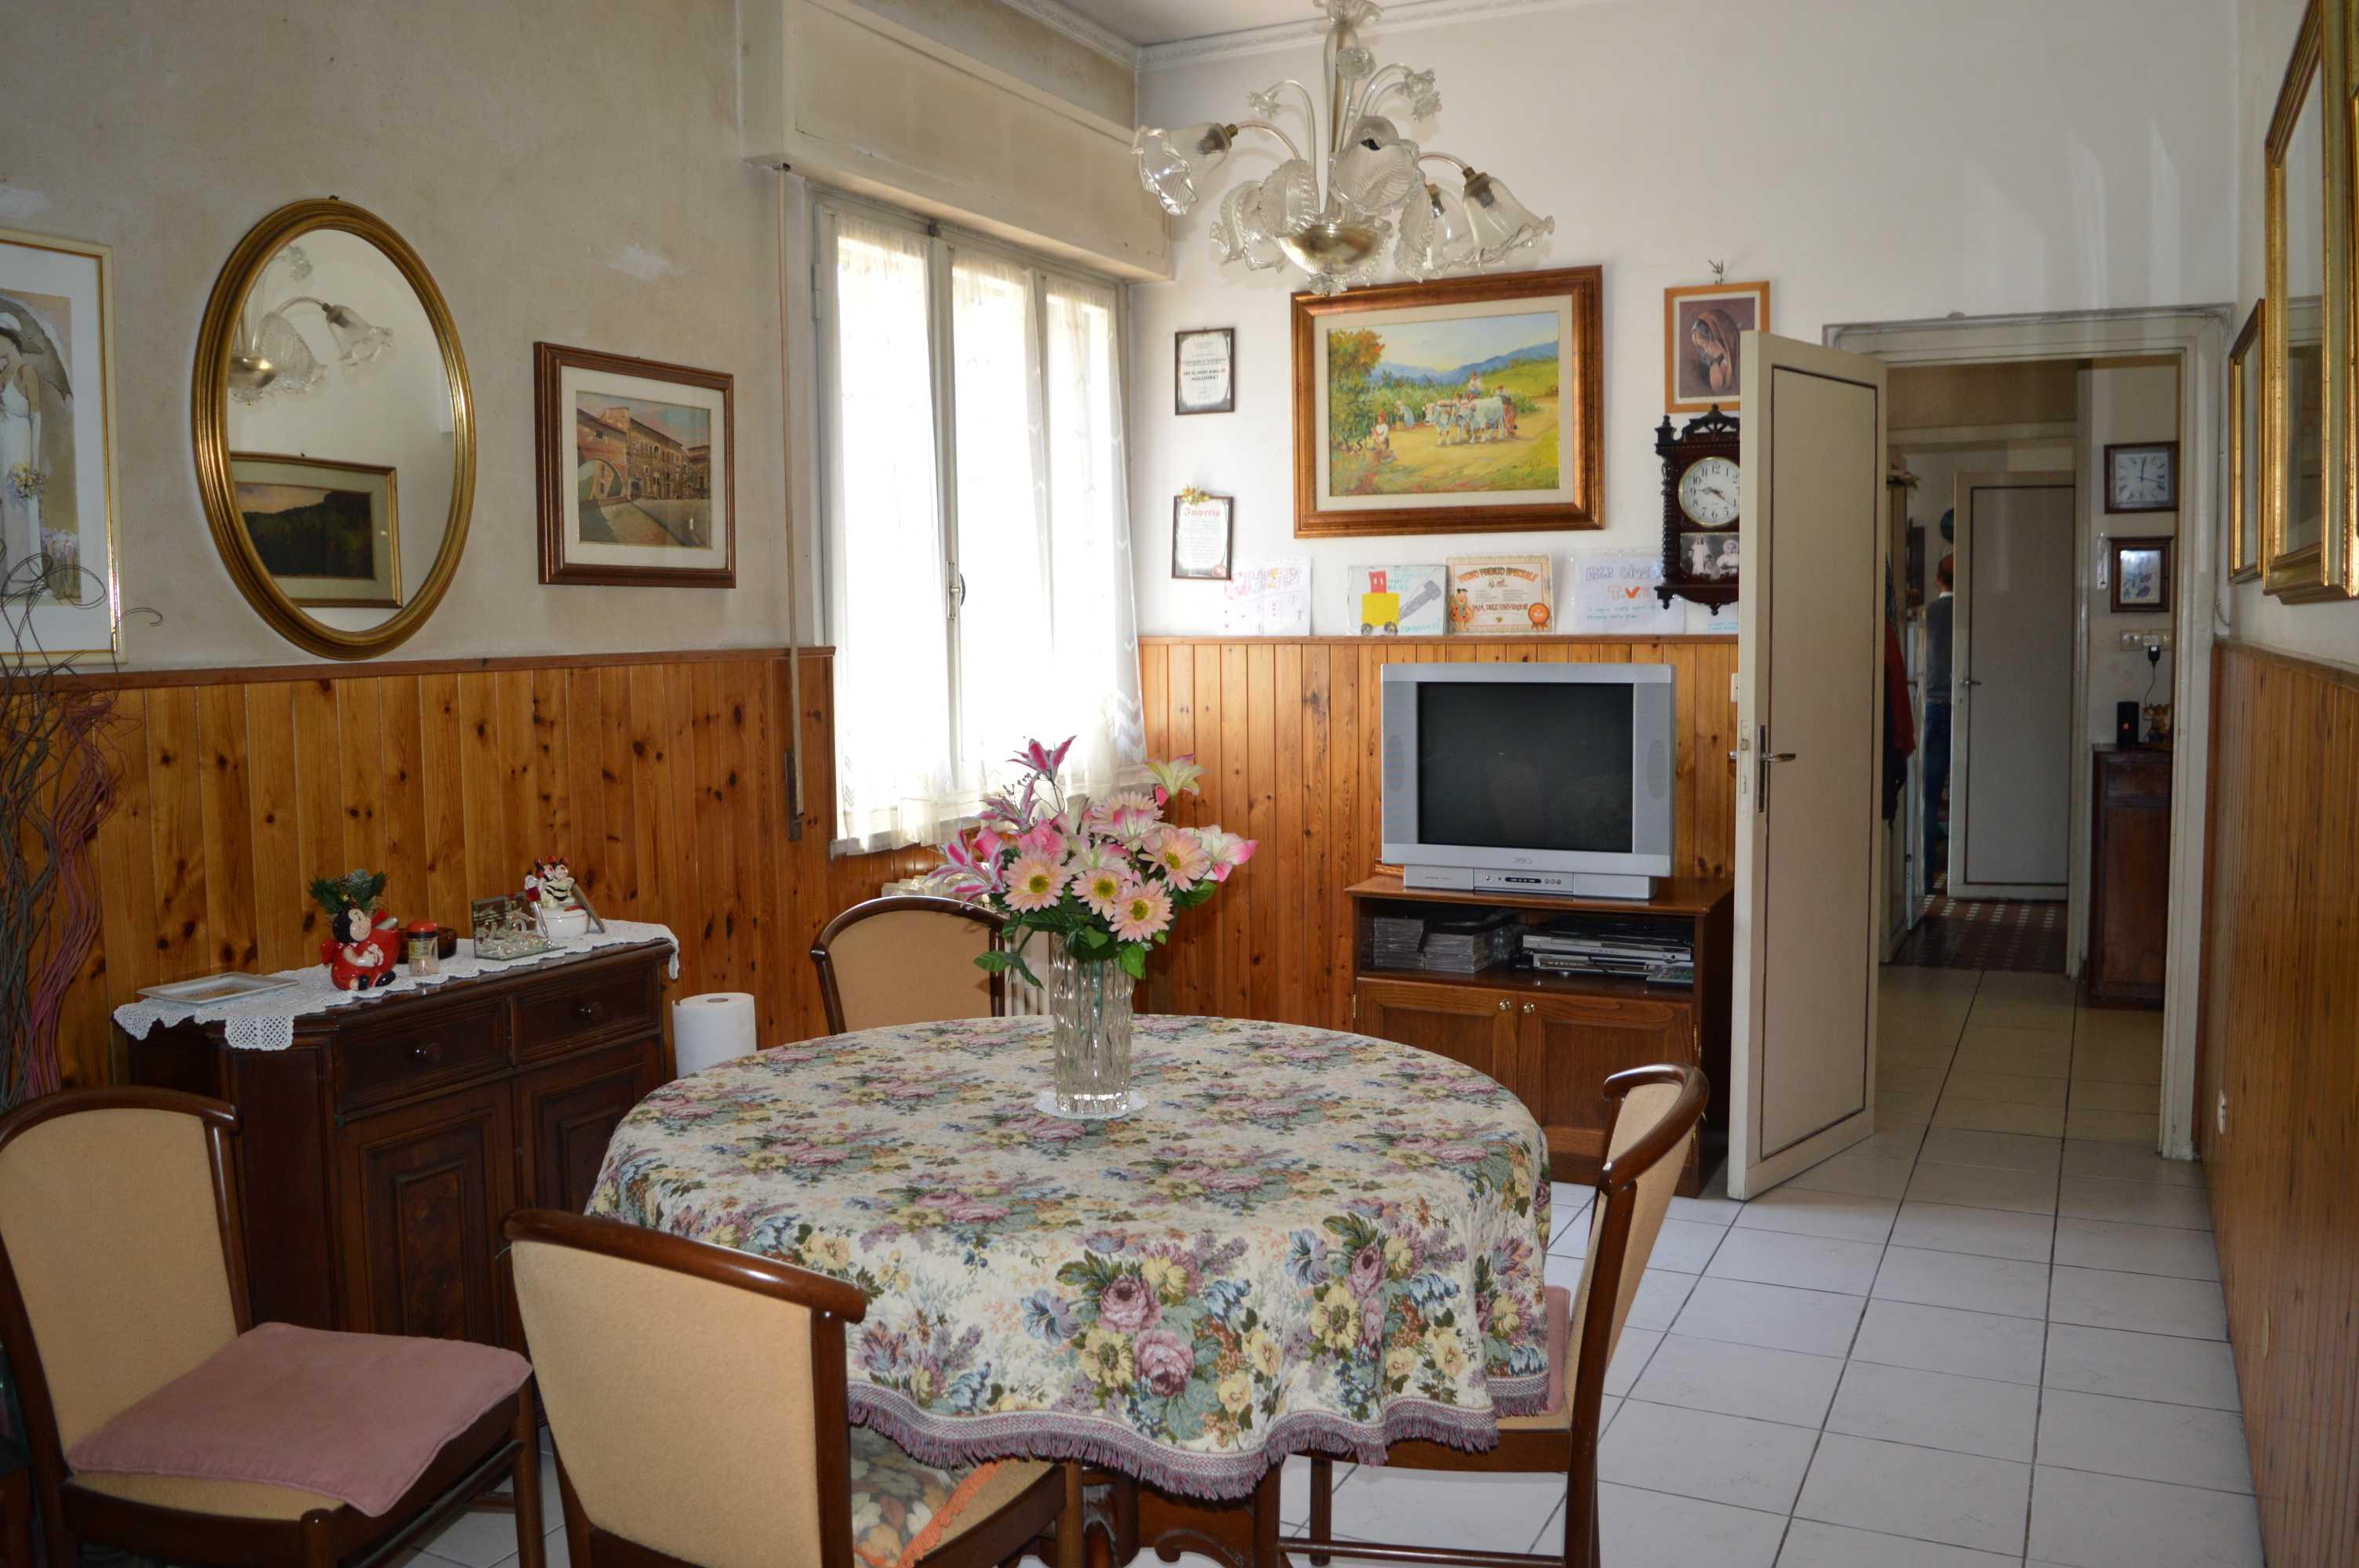 Appartamento in bifamiliare al piano terra con resede